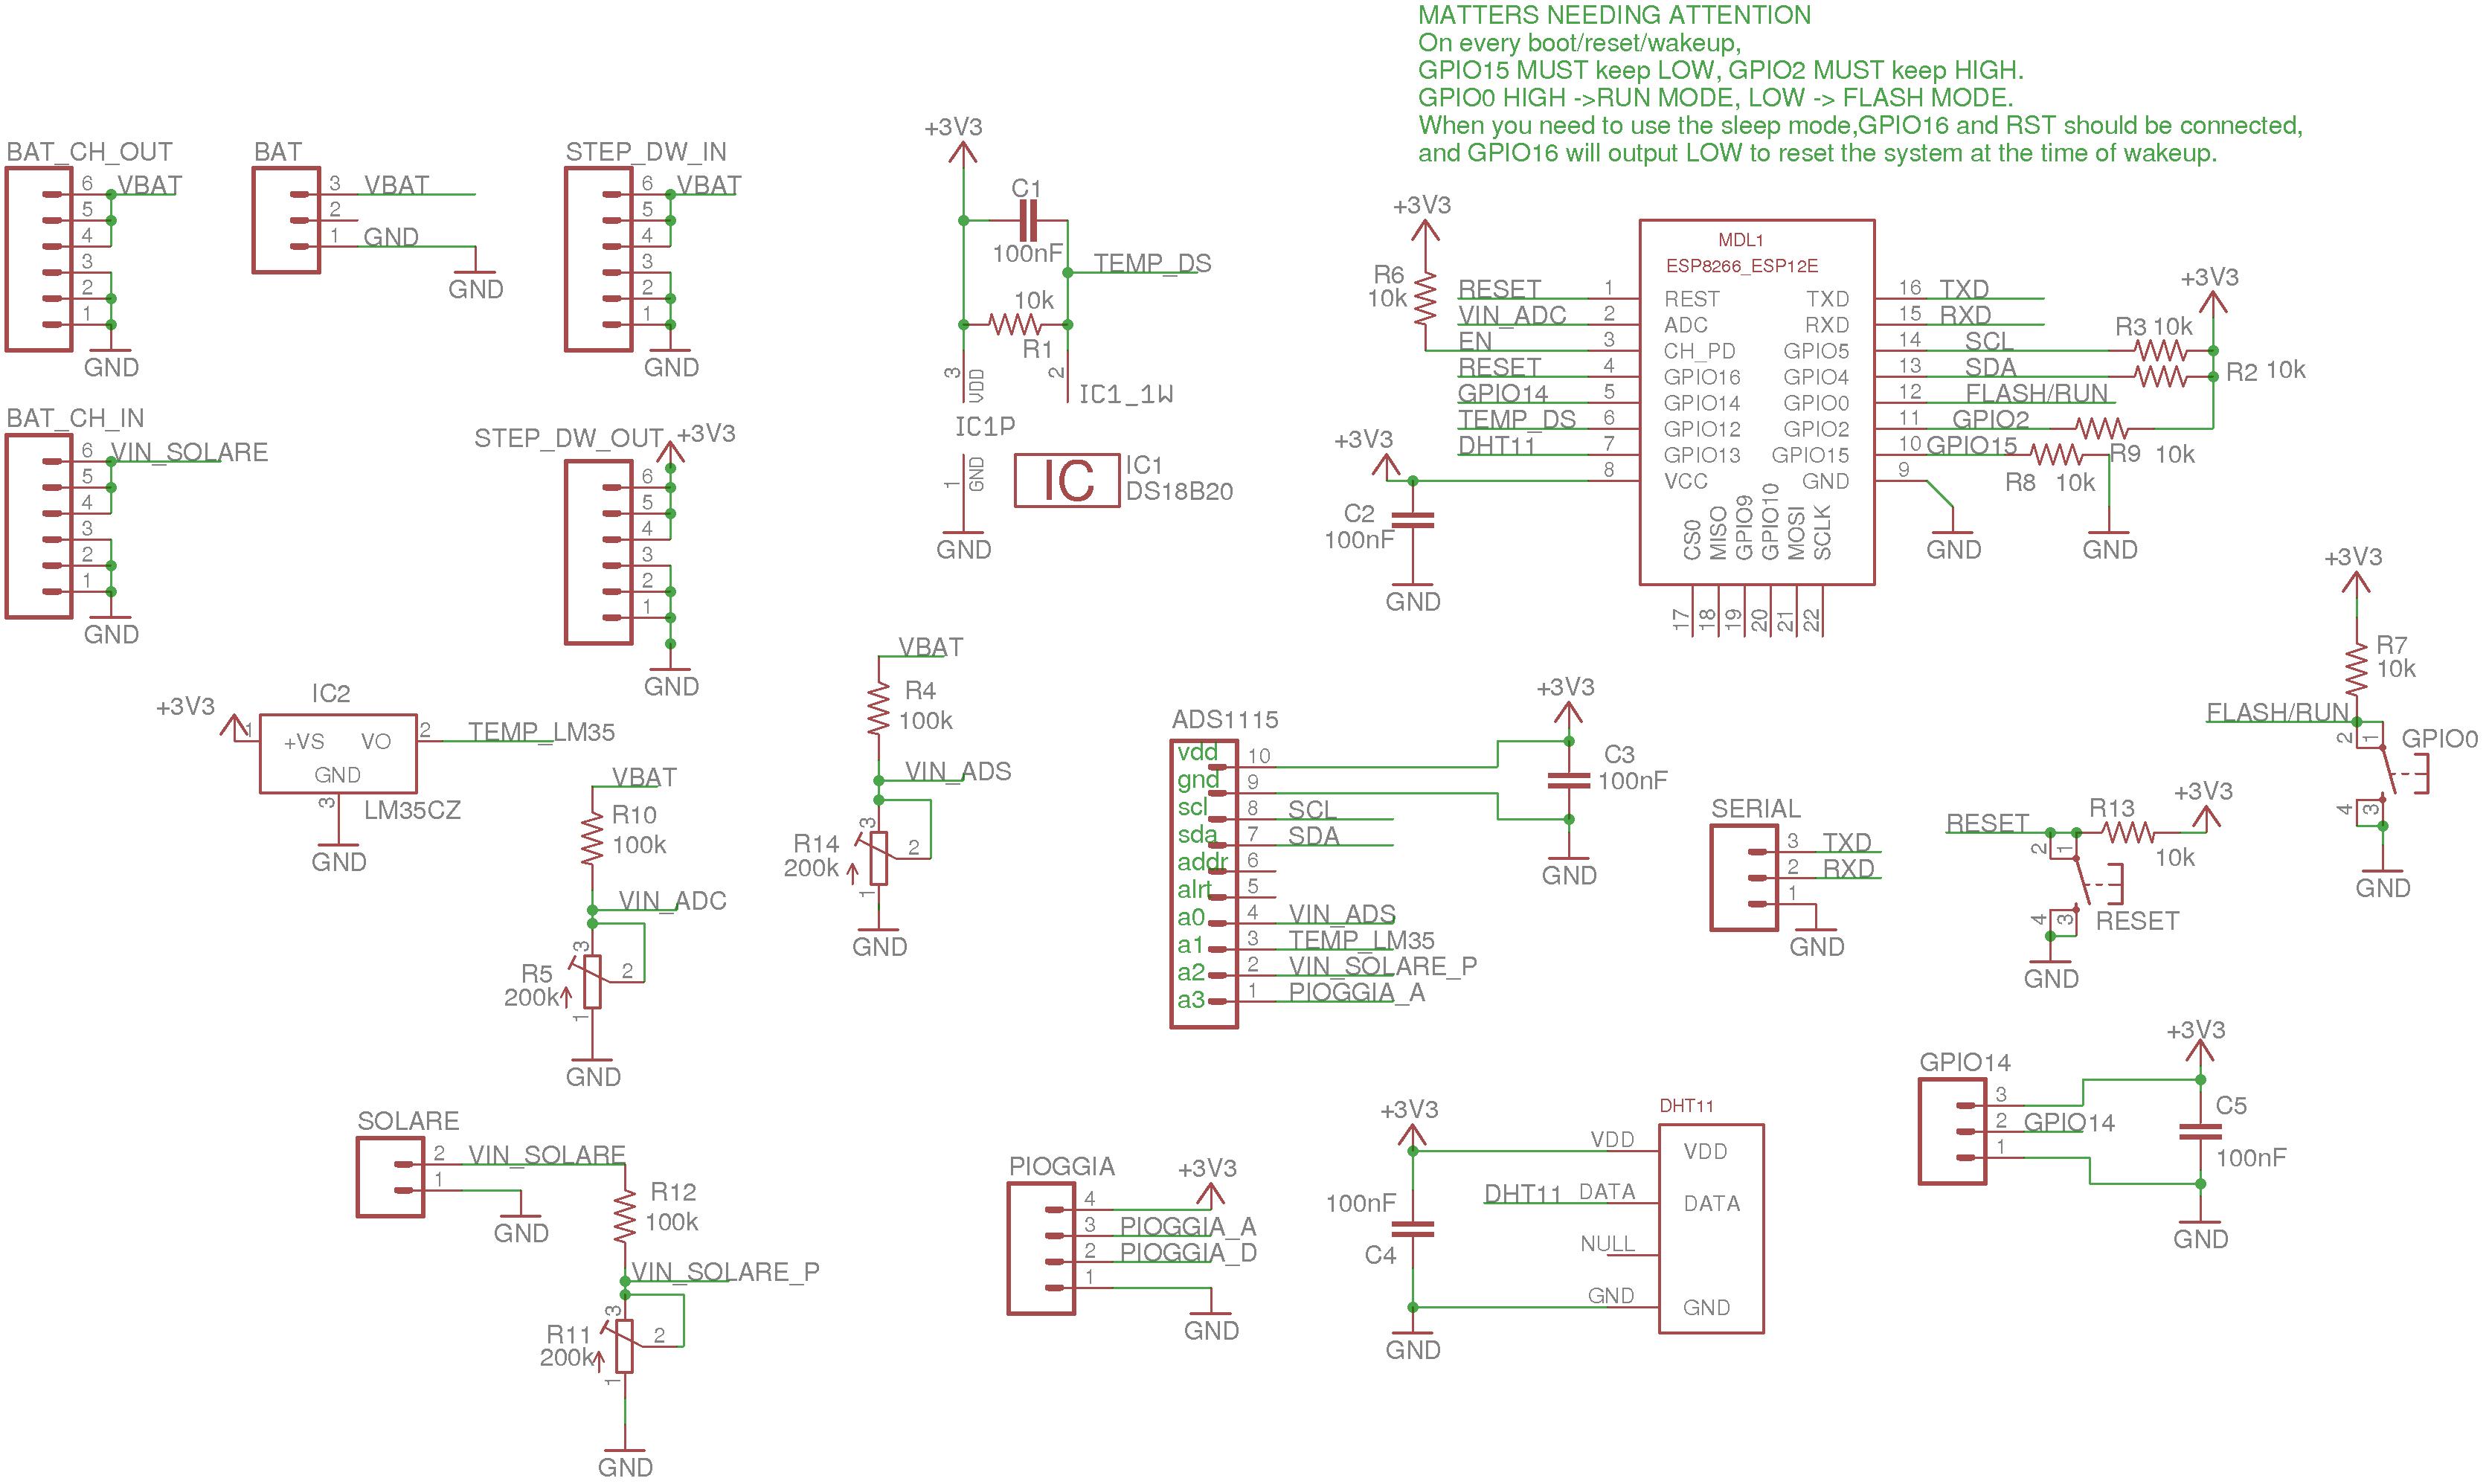 schematic_extpng3346x1995 108 kb